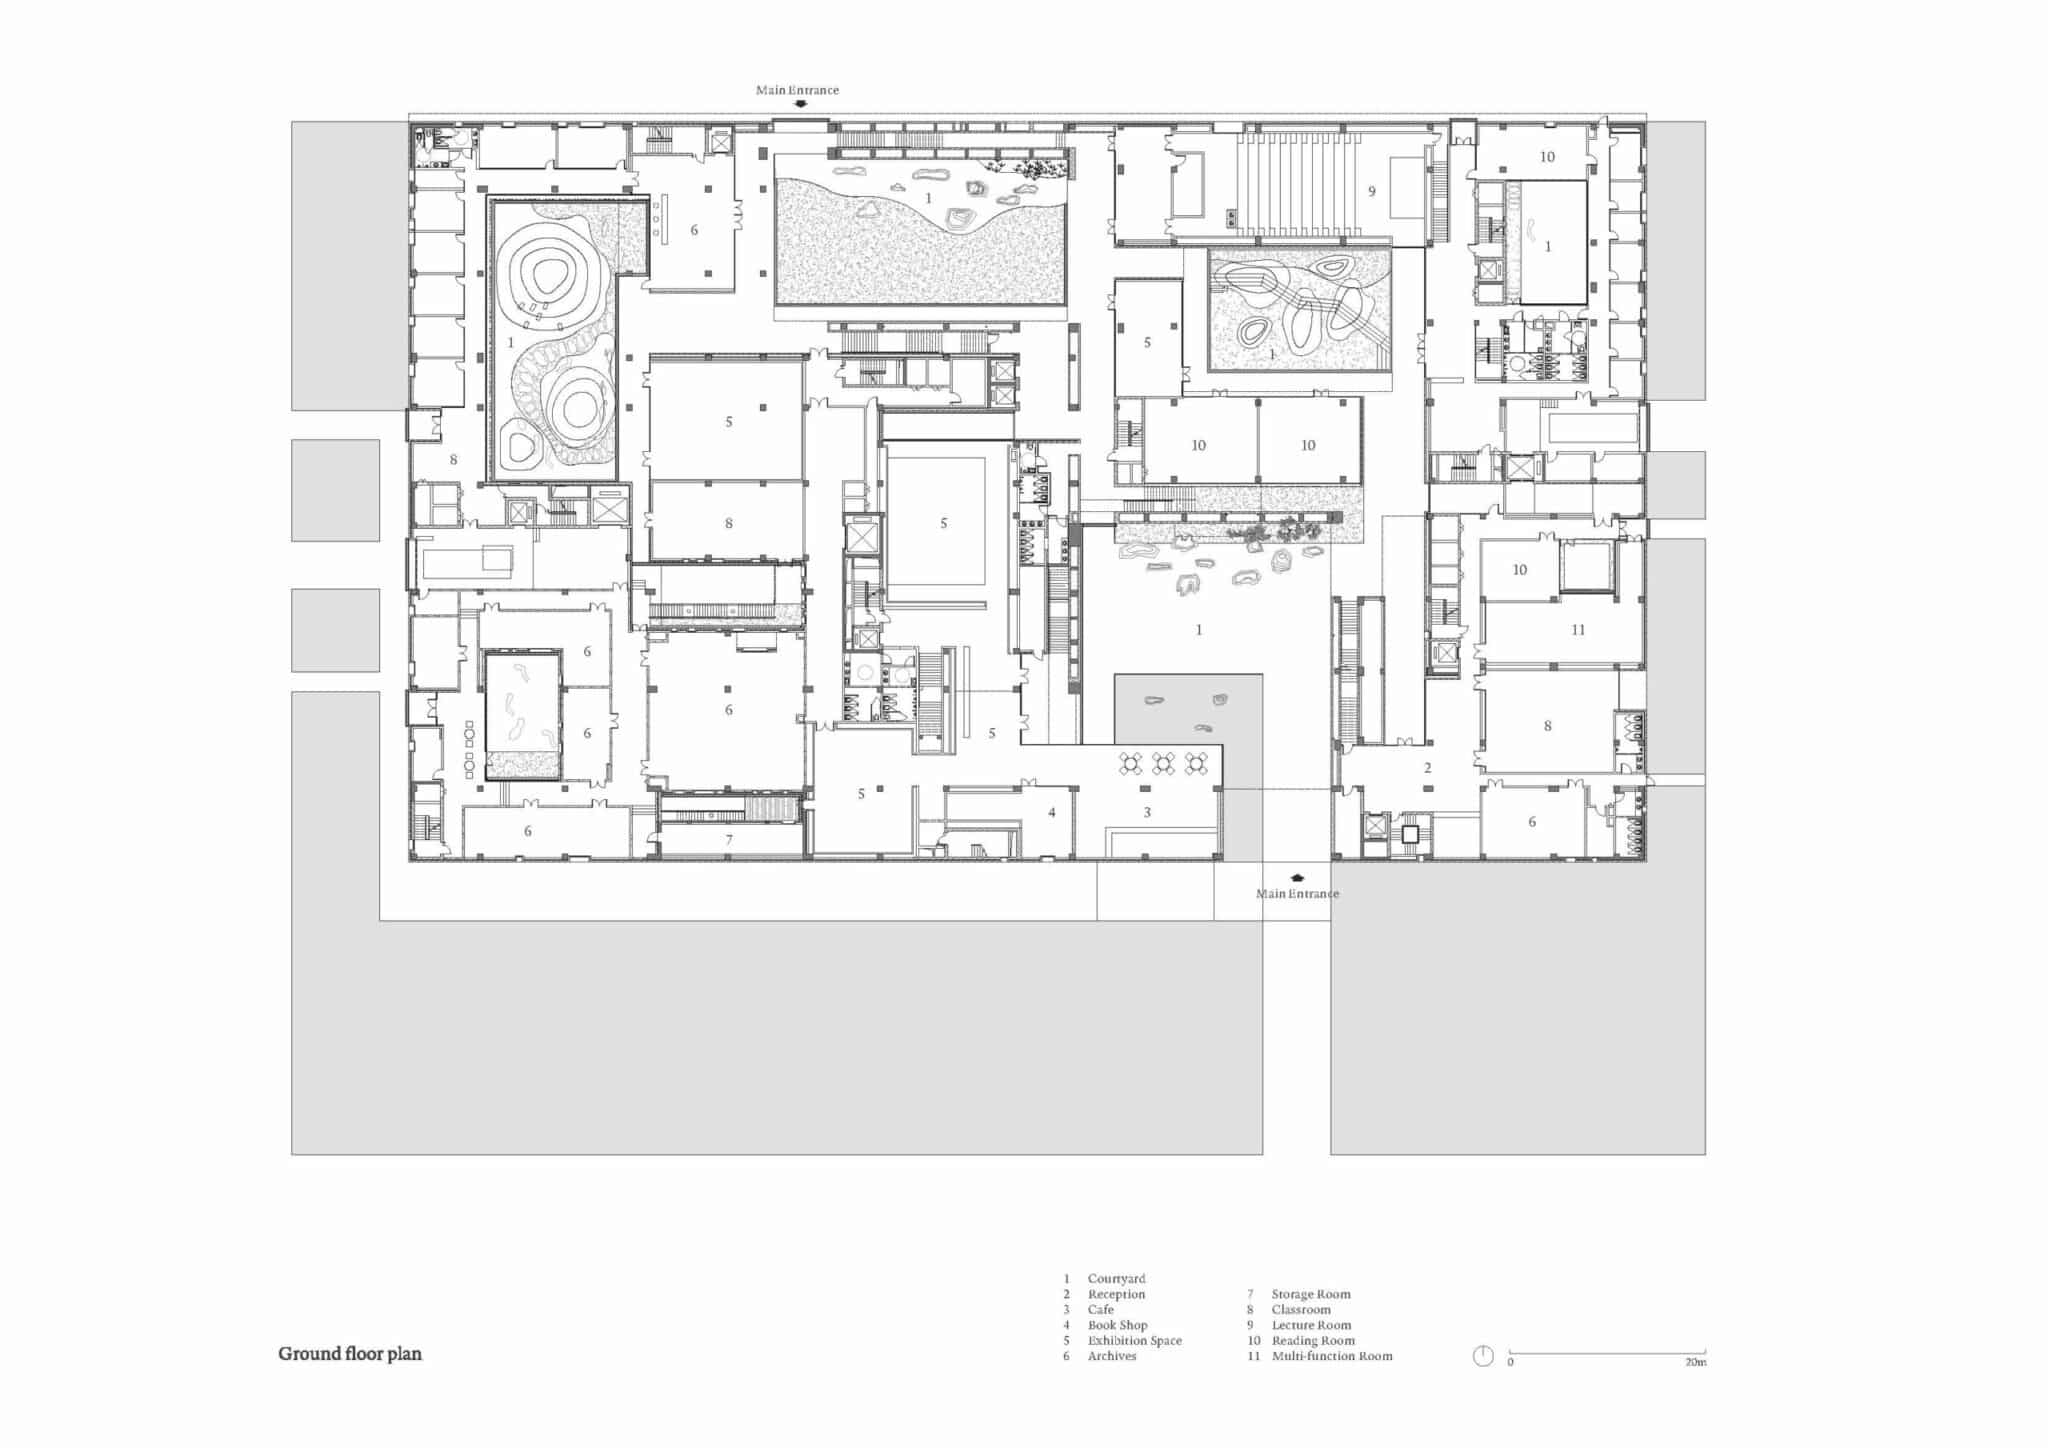 Shou County Culture and Art Center  - 20210702 Zhu Pei ShouCountyCultureArtCenter 12.2.1 scaled 61